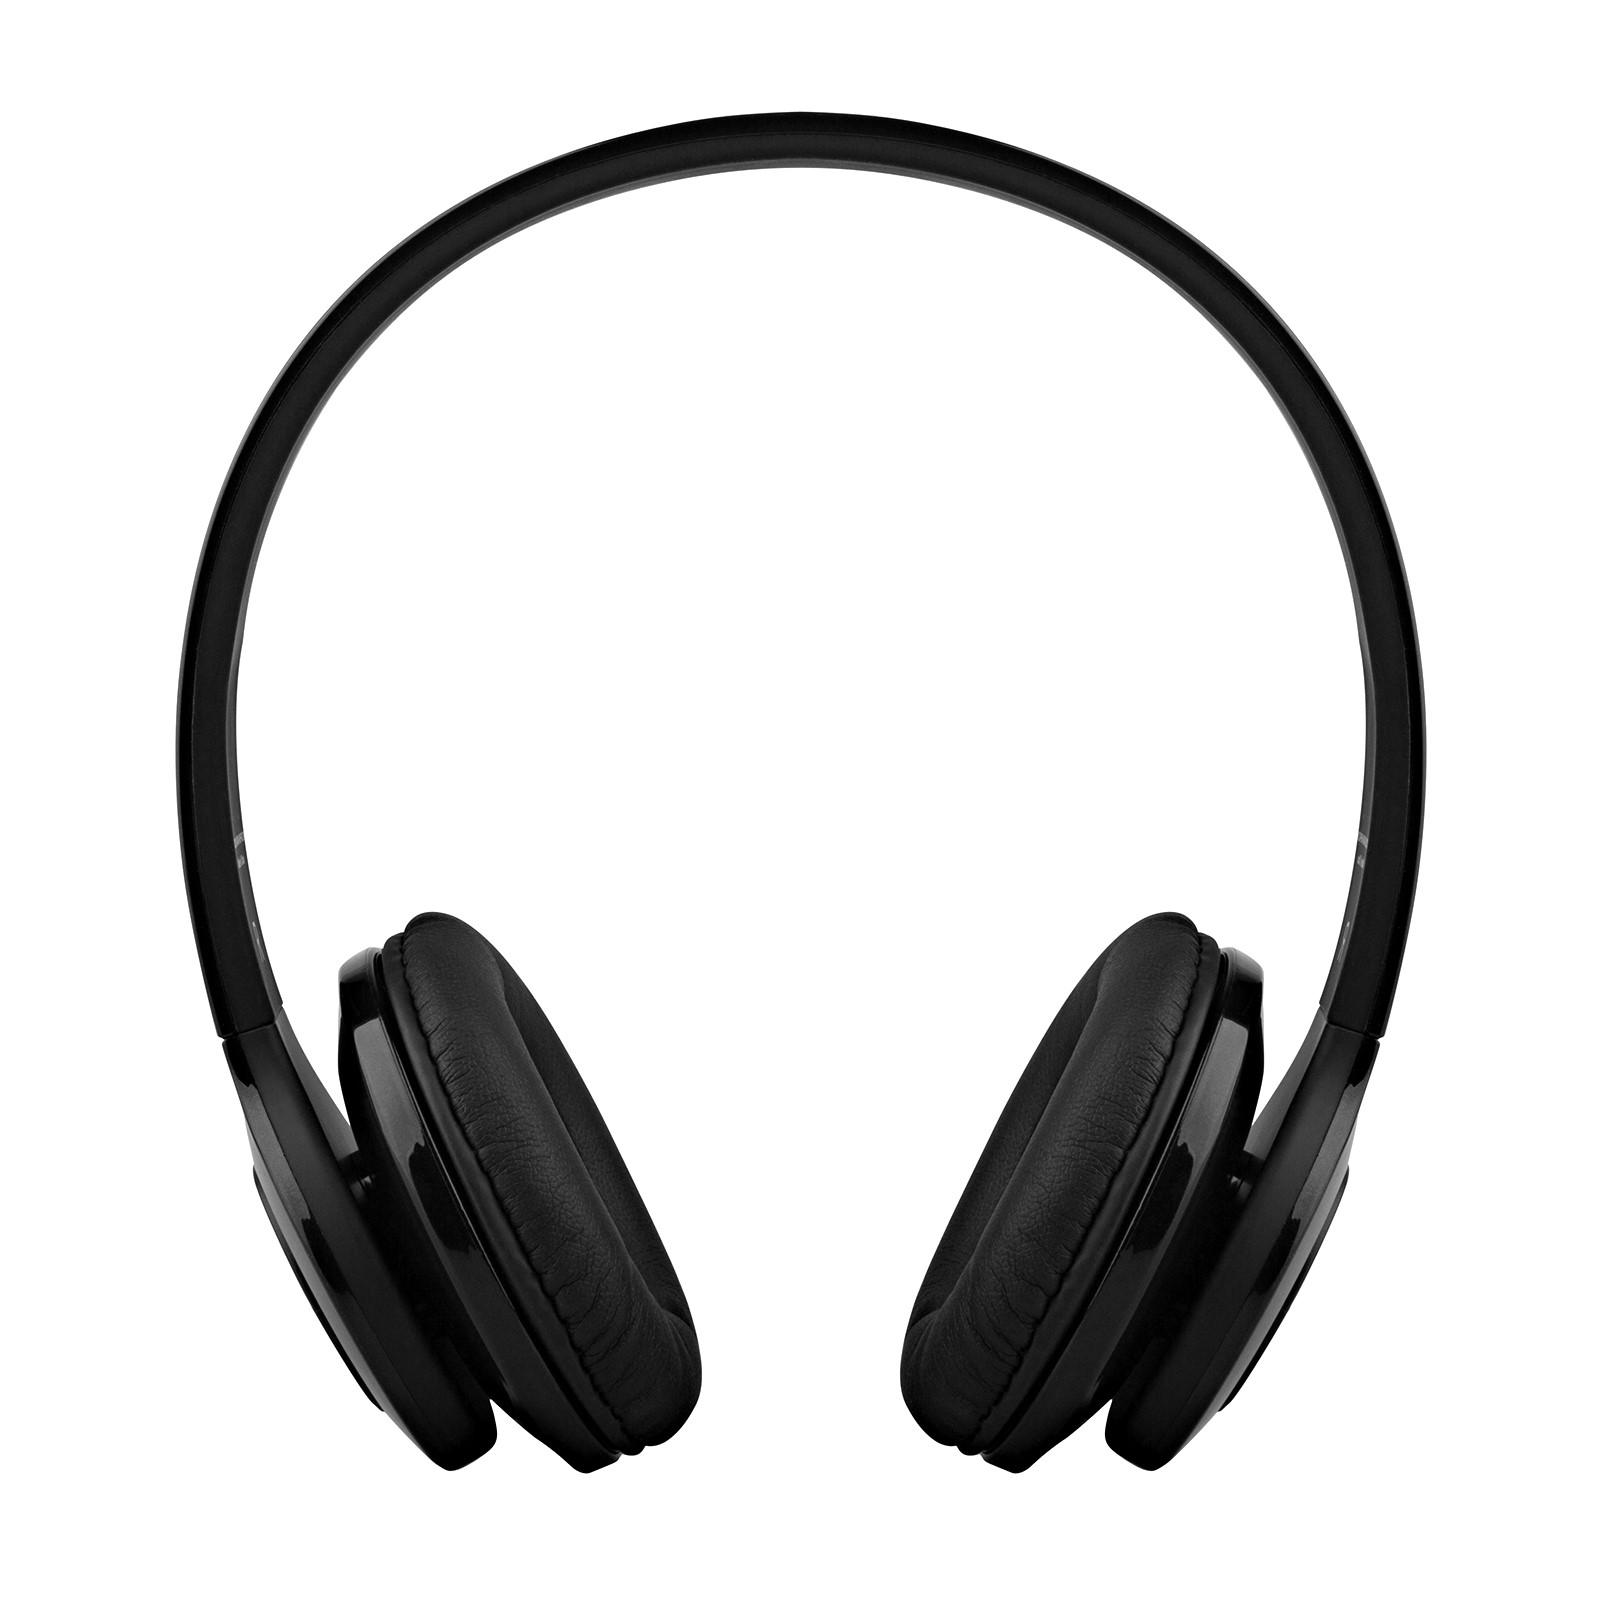 jam transit wireless bluetooth active on ear headphones w on ear remote control ebay. Black Bedroom Furniture Sets. Home Design Ideas